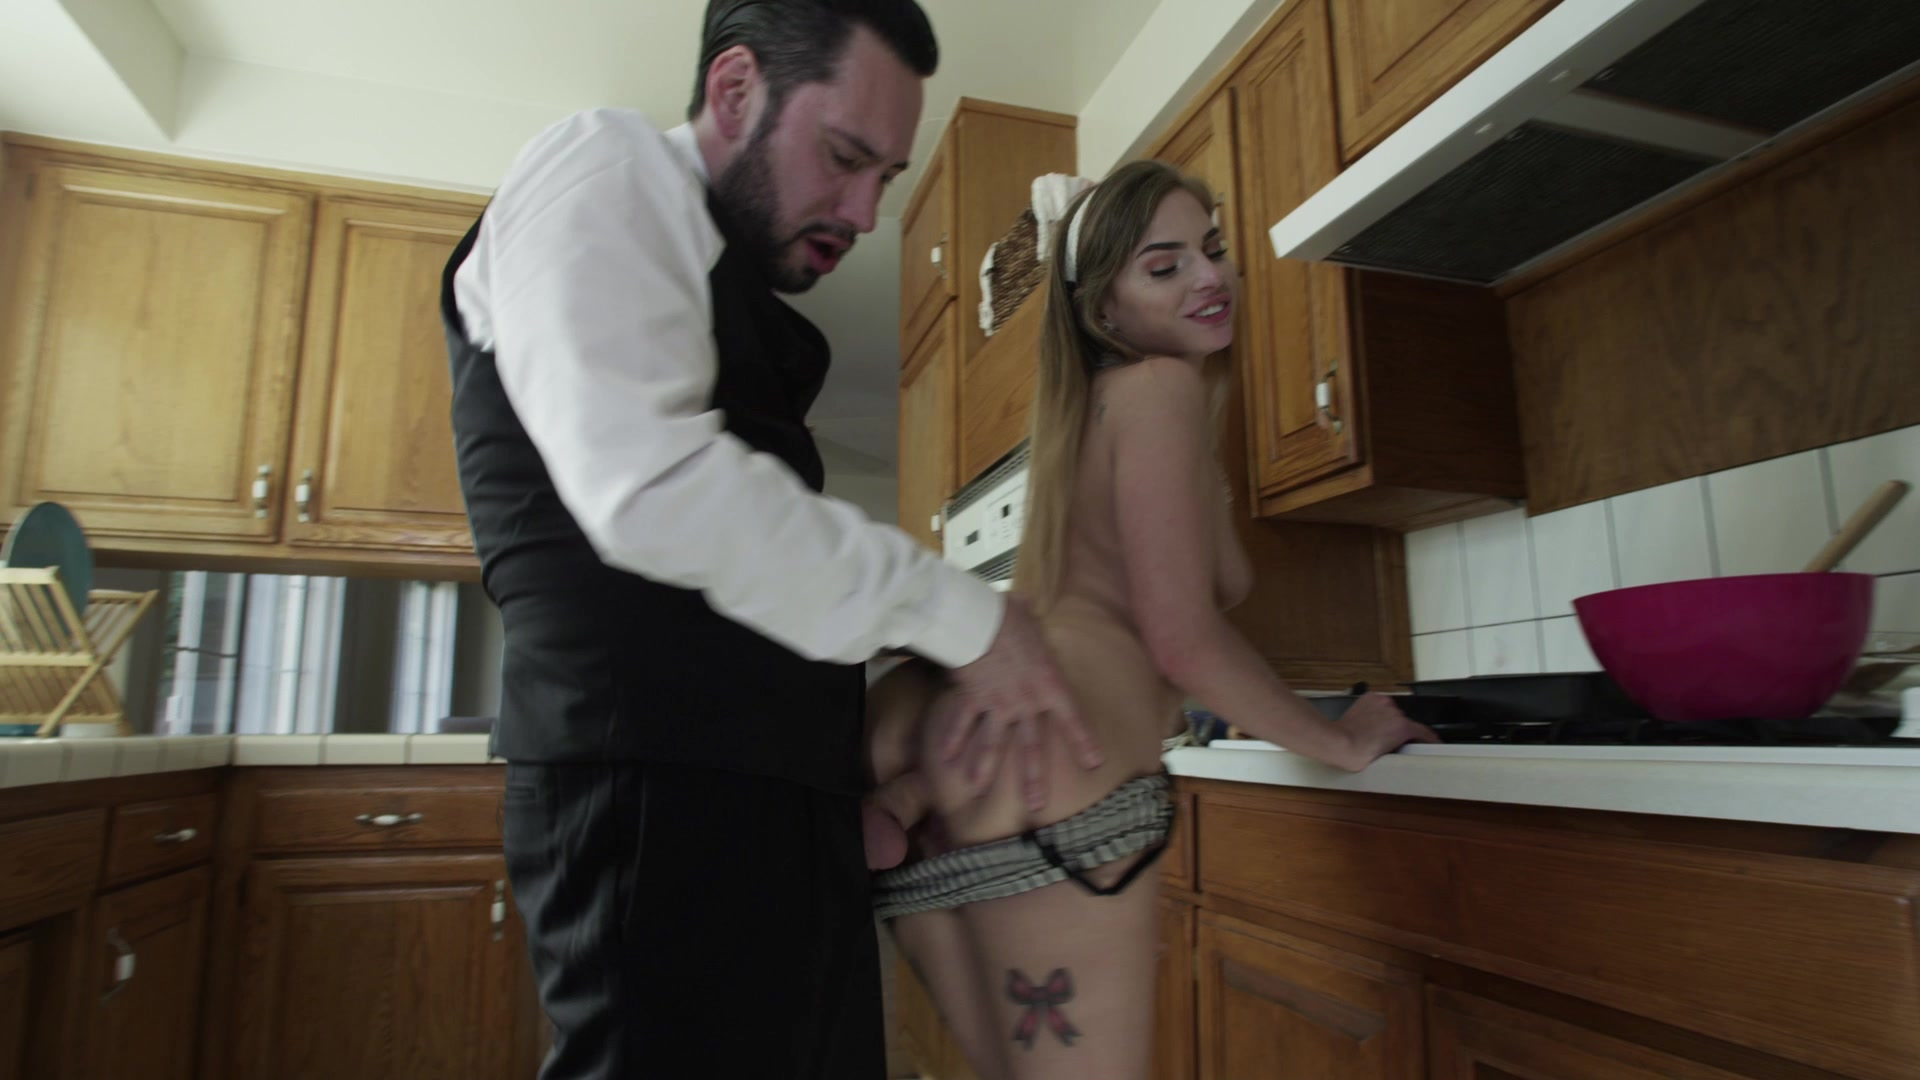 sydney cole porn videos